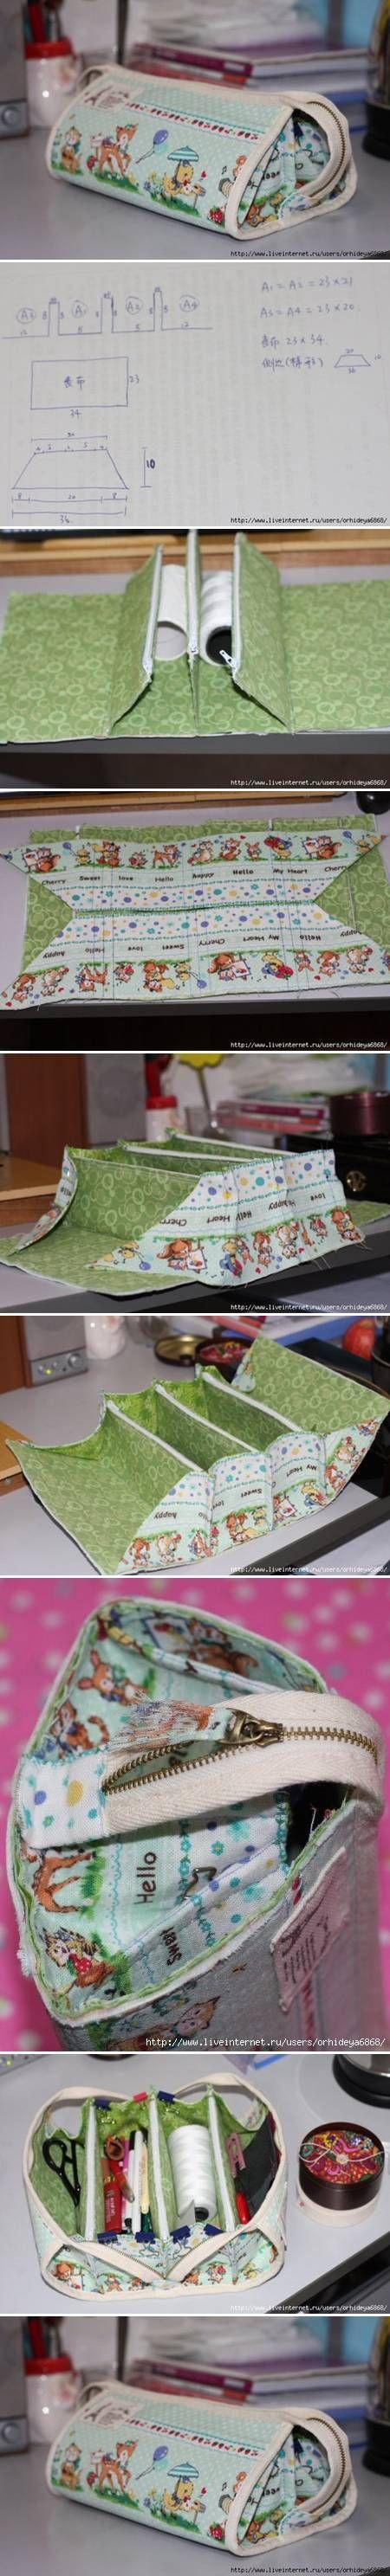 DIY Handbag for Needlework